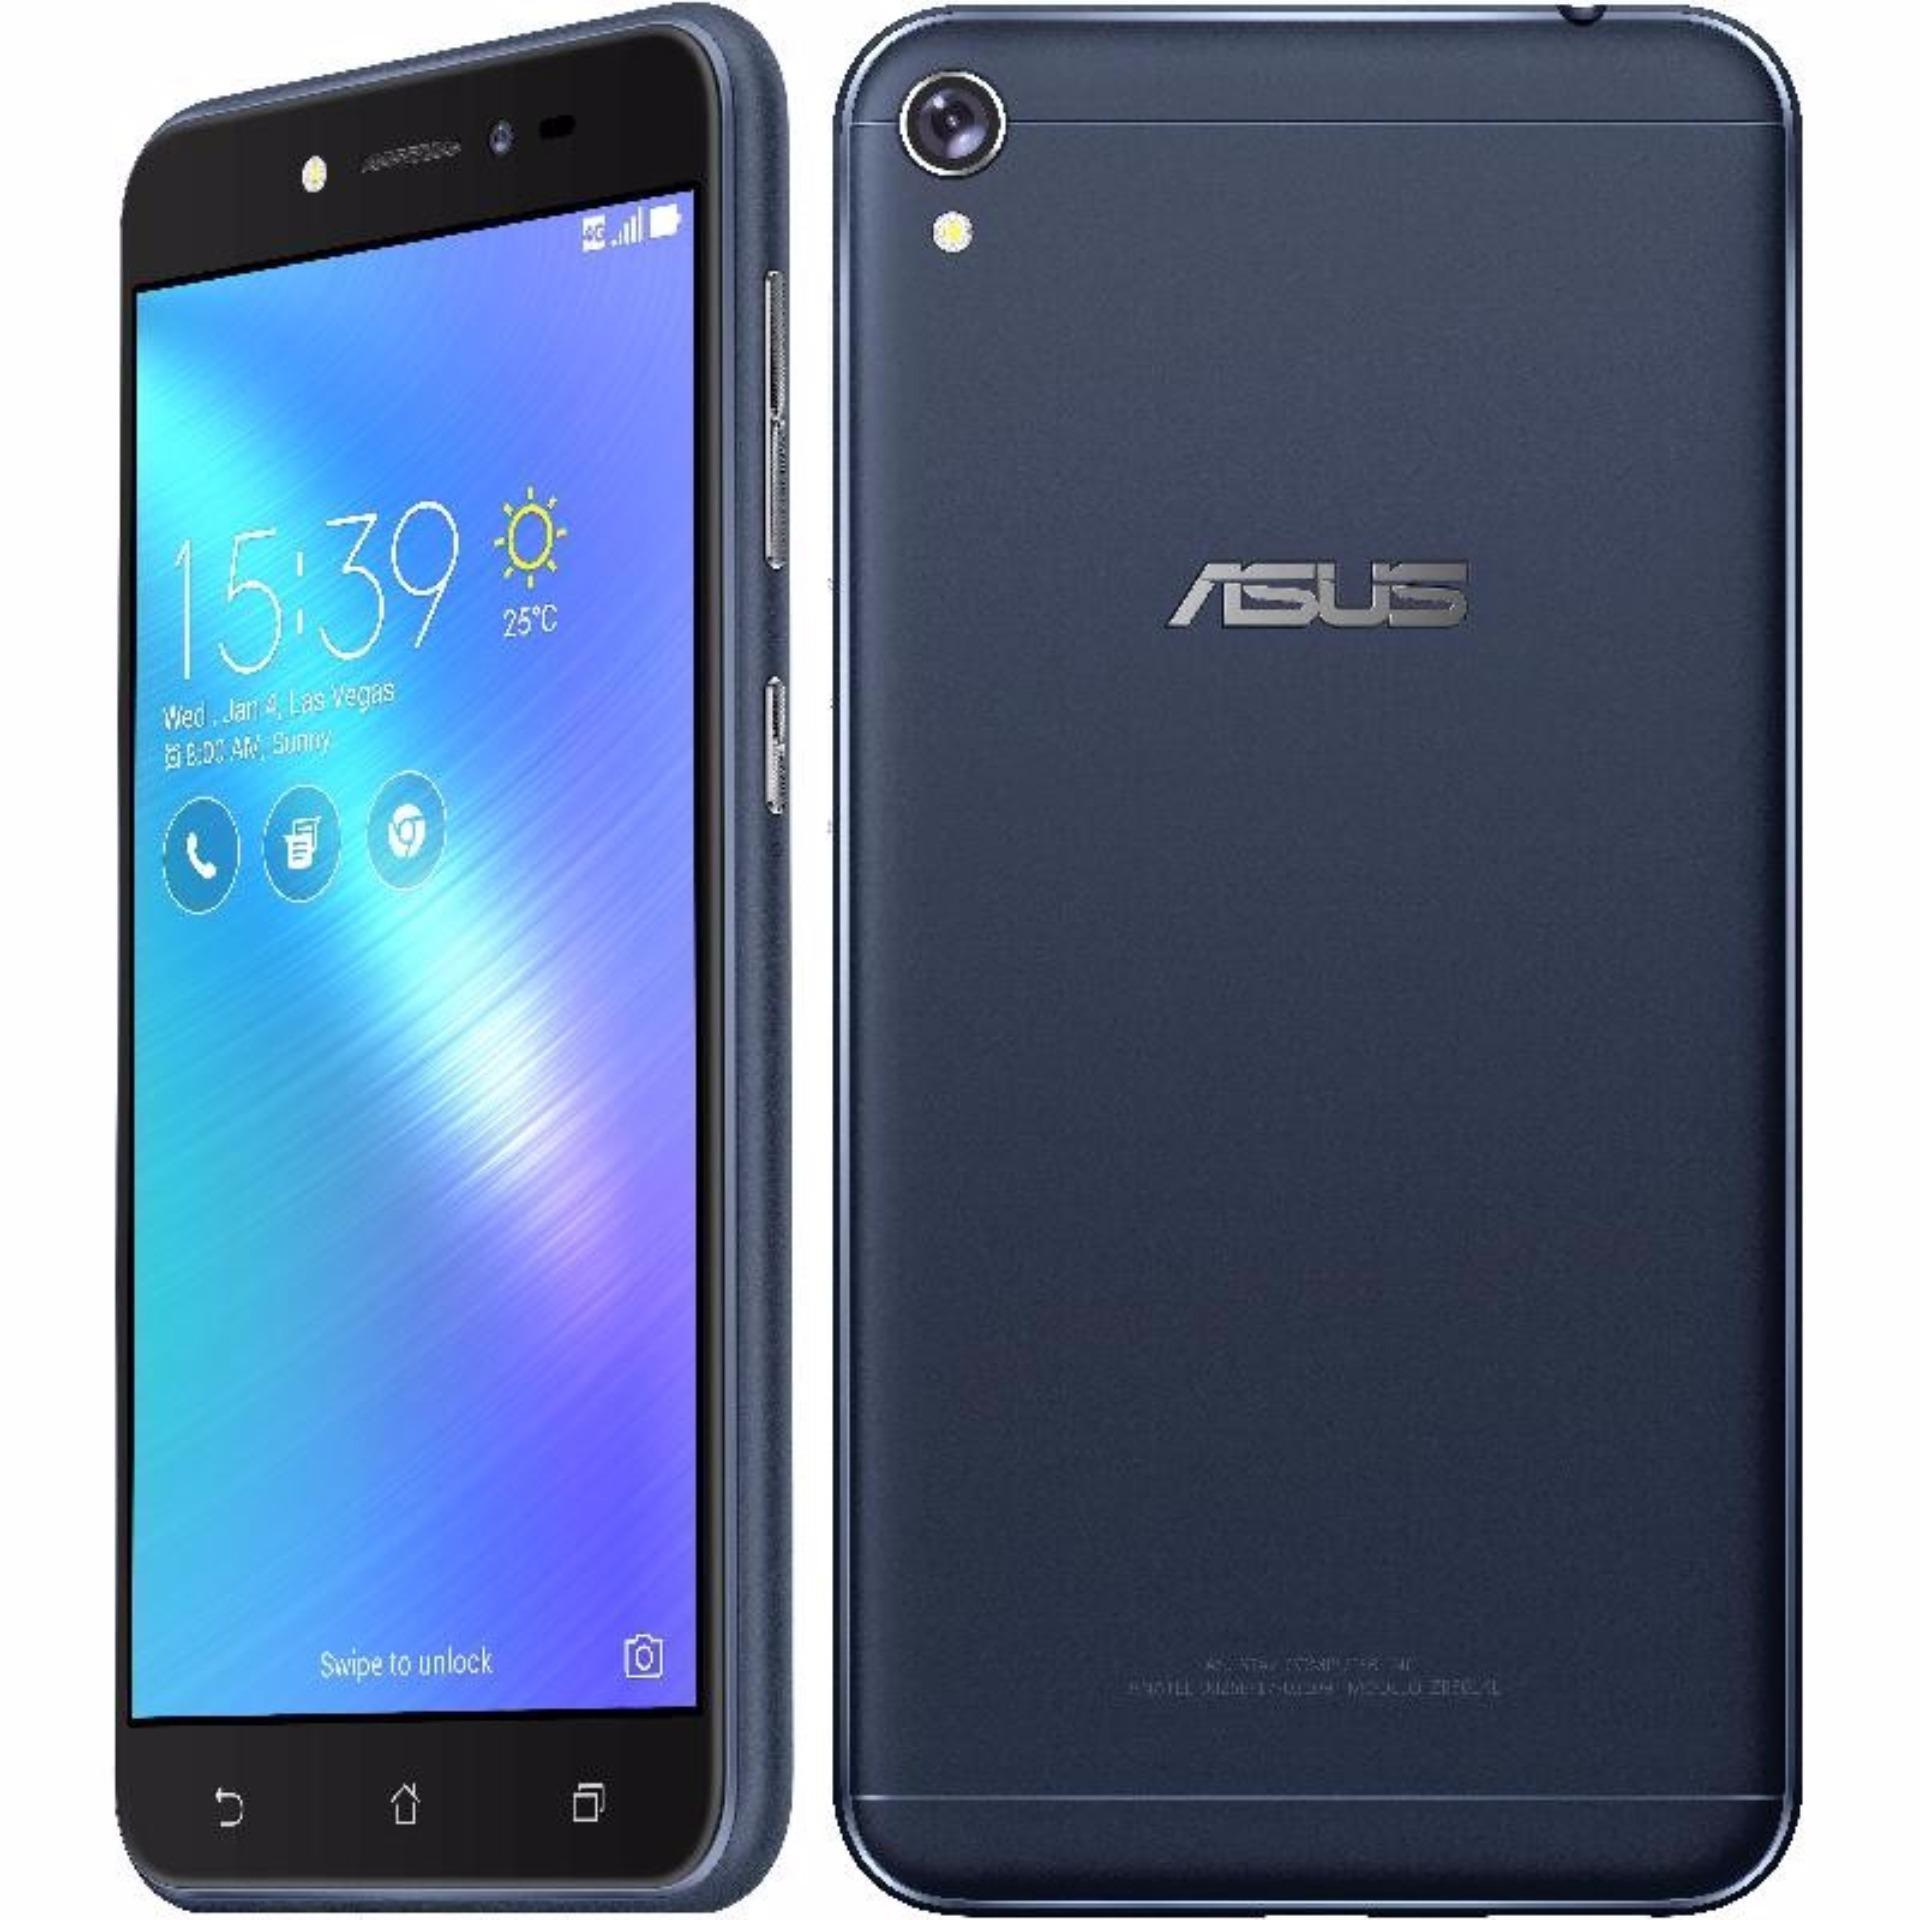 Penawaran Terbaik Asus X540ya Amd E1 7010 Ram 2gb 500gb 156 Zenfone Live Zb501kl